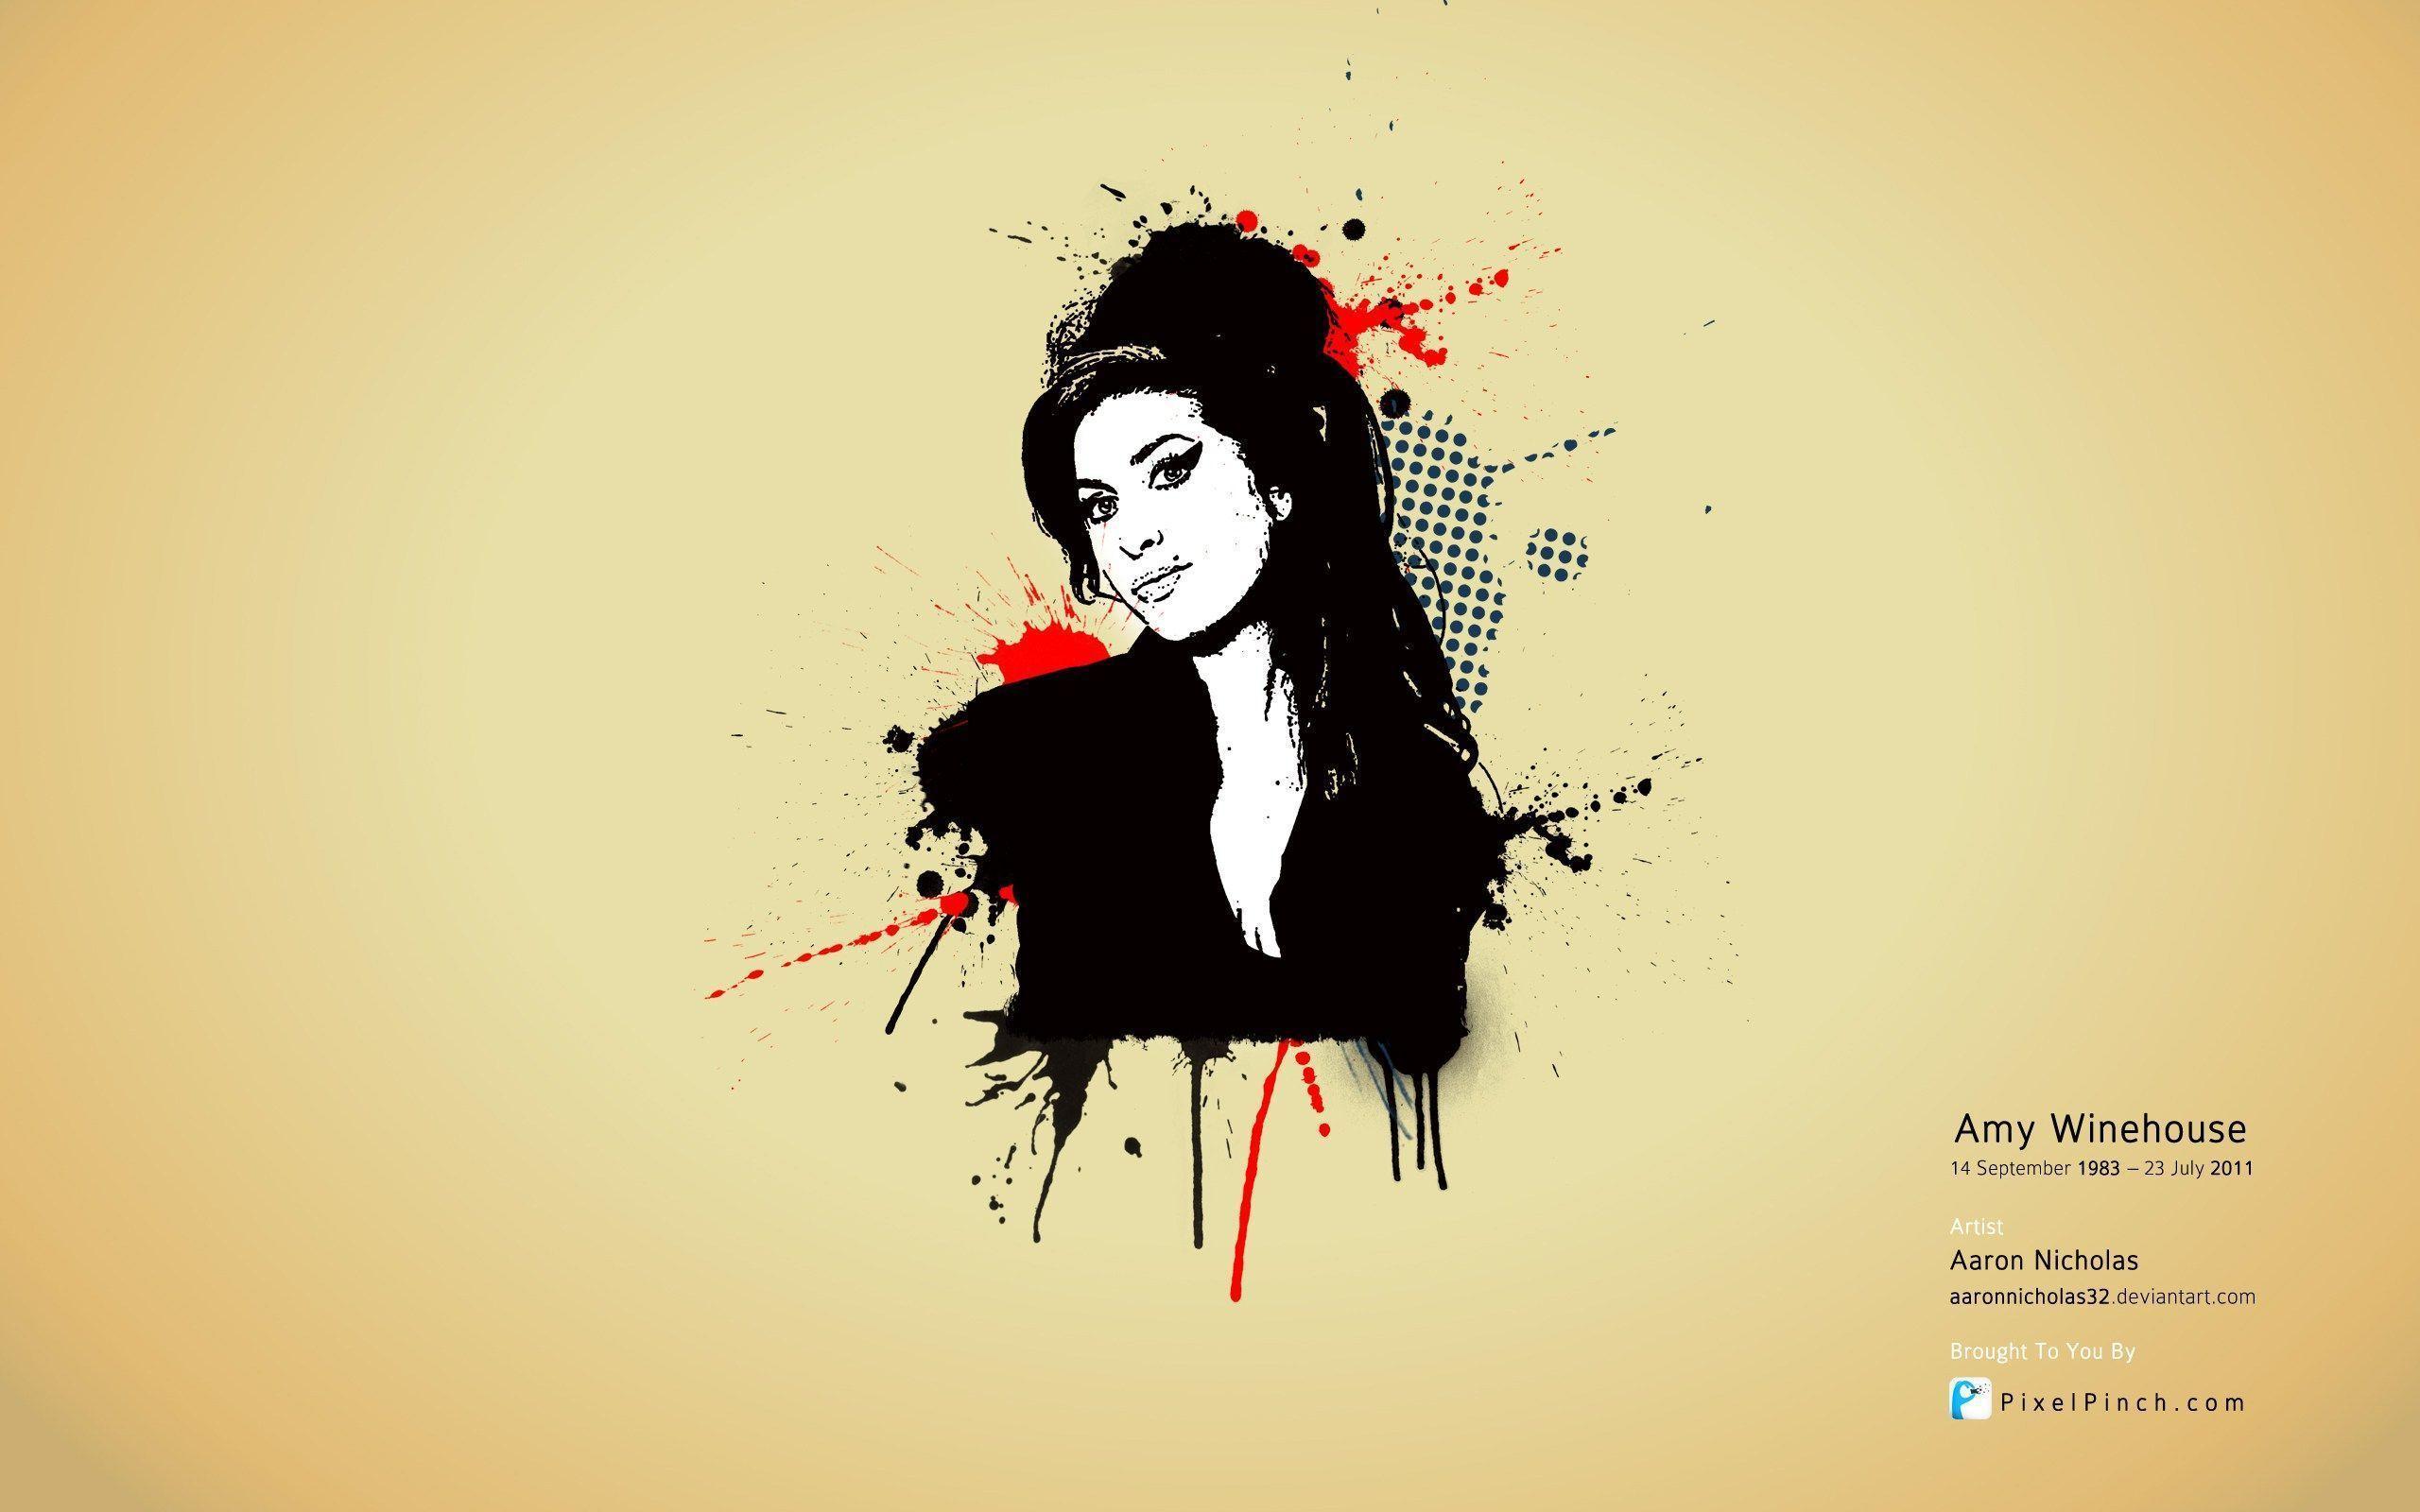 Amy Winehouse Images